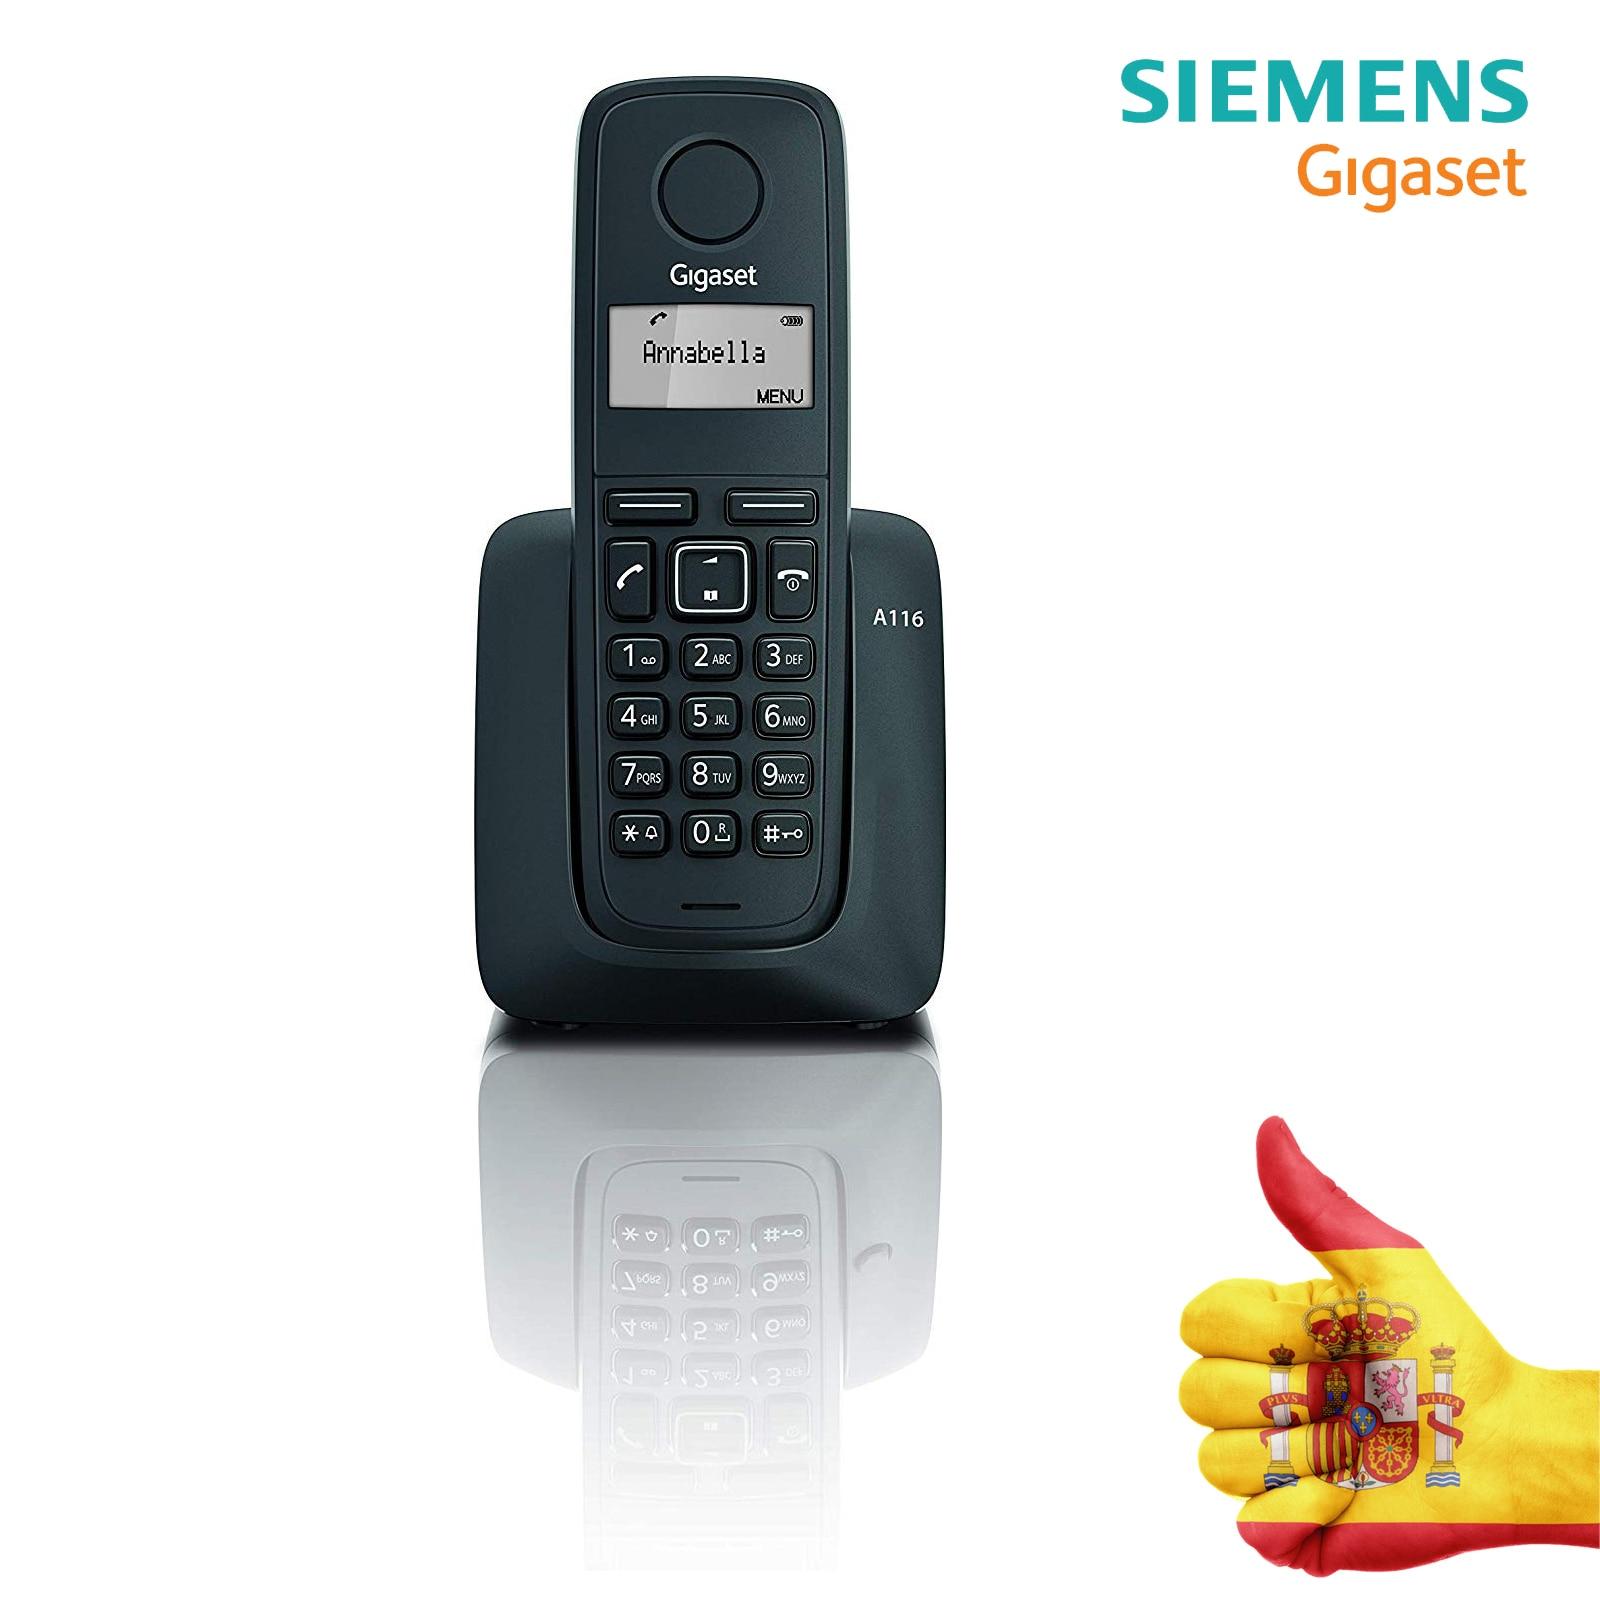 WIRELESS PHONE SIEMEN S-GIGASET A116 BLACK Agenda 50 Contacts